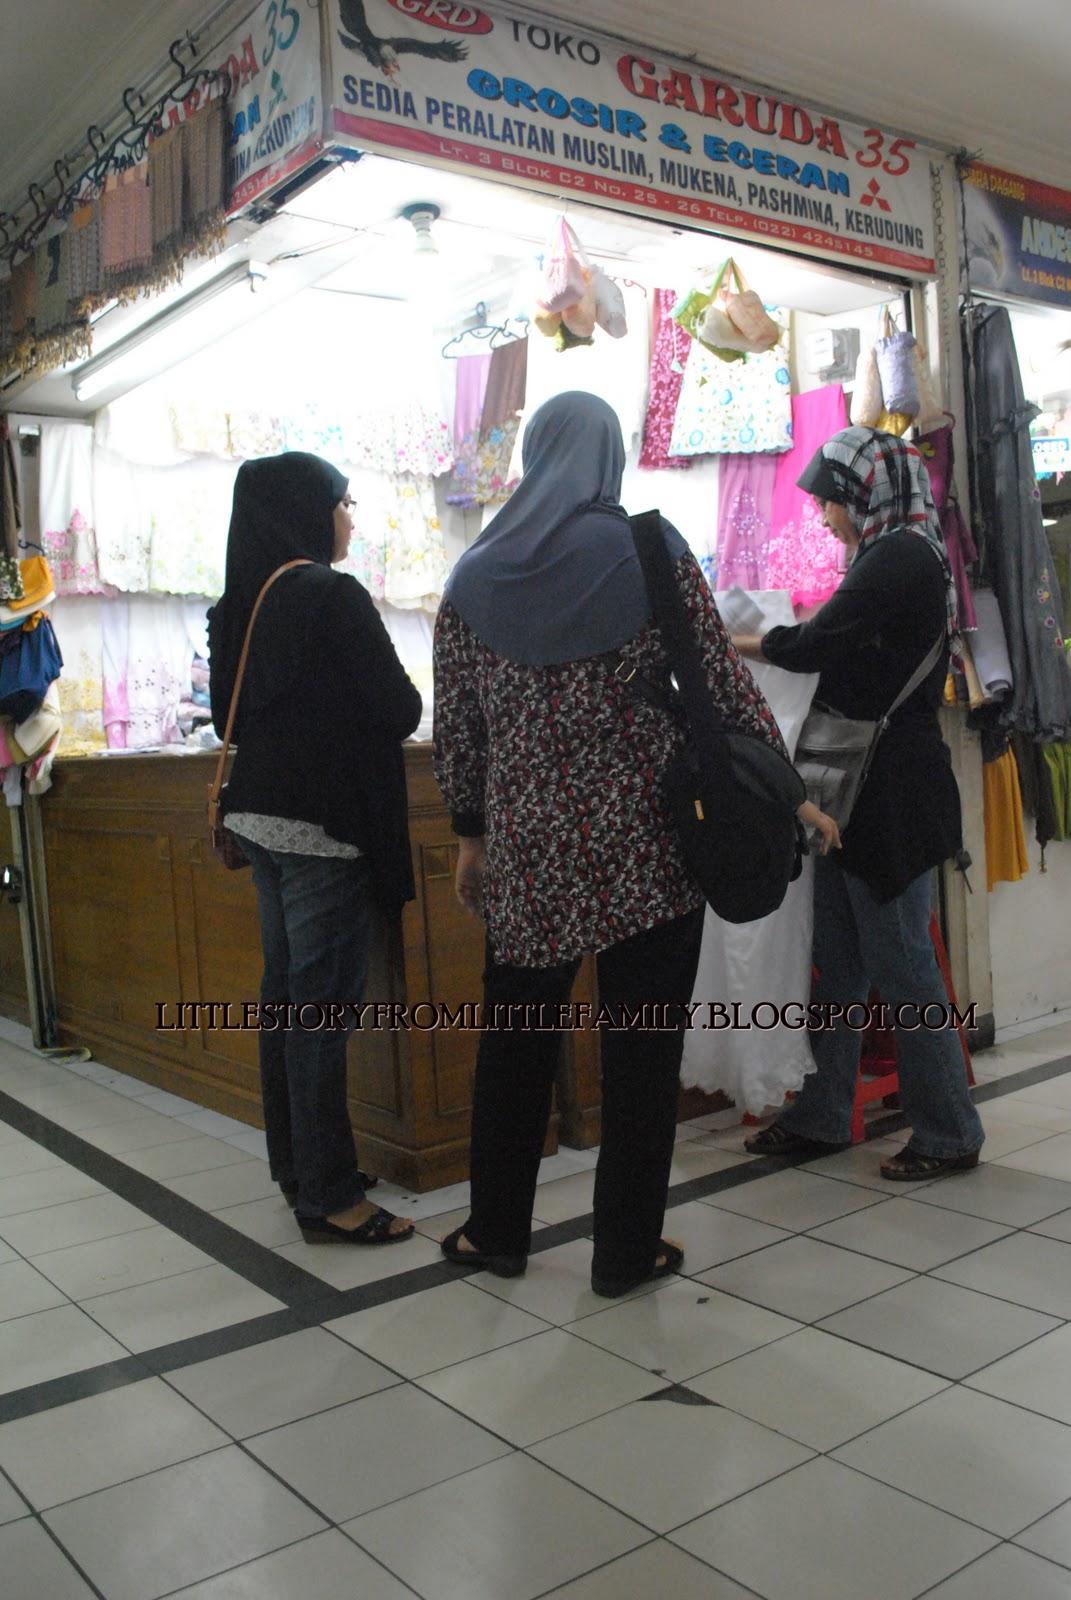 GtCuti Cuti Di Bandung Day 2 Pasar Baru